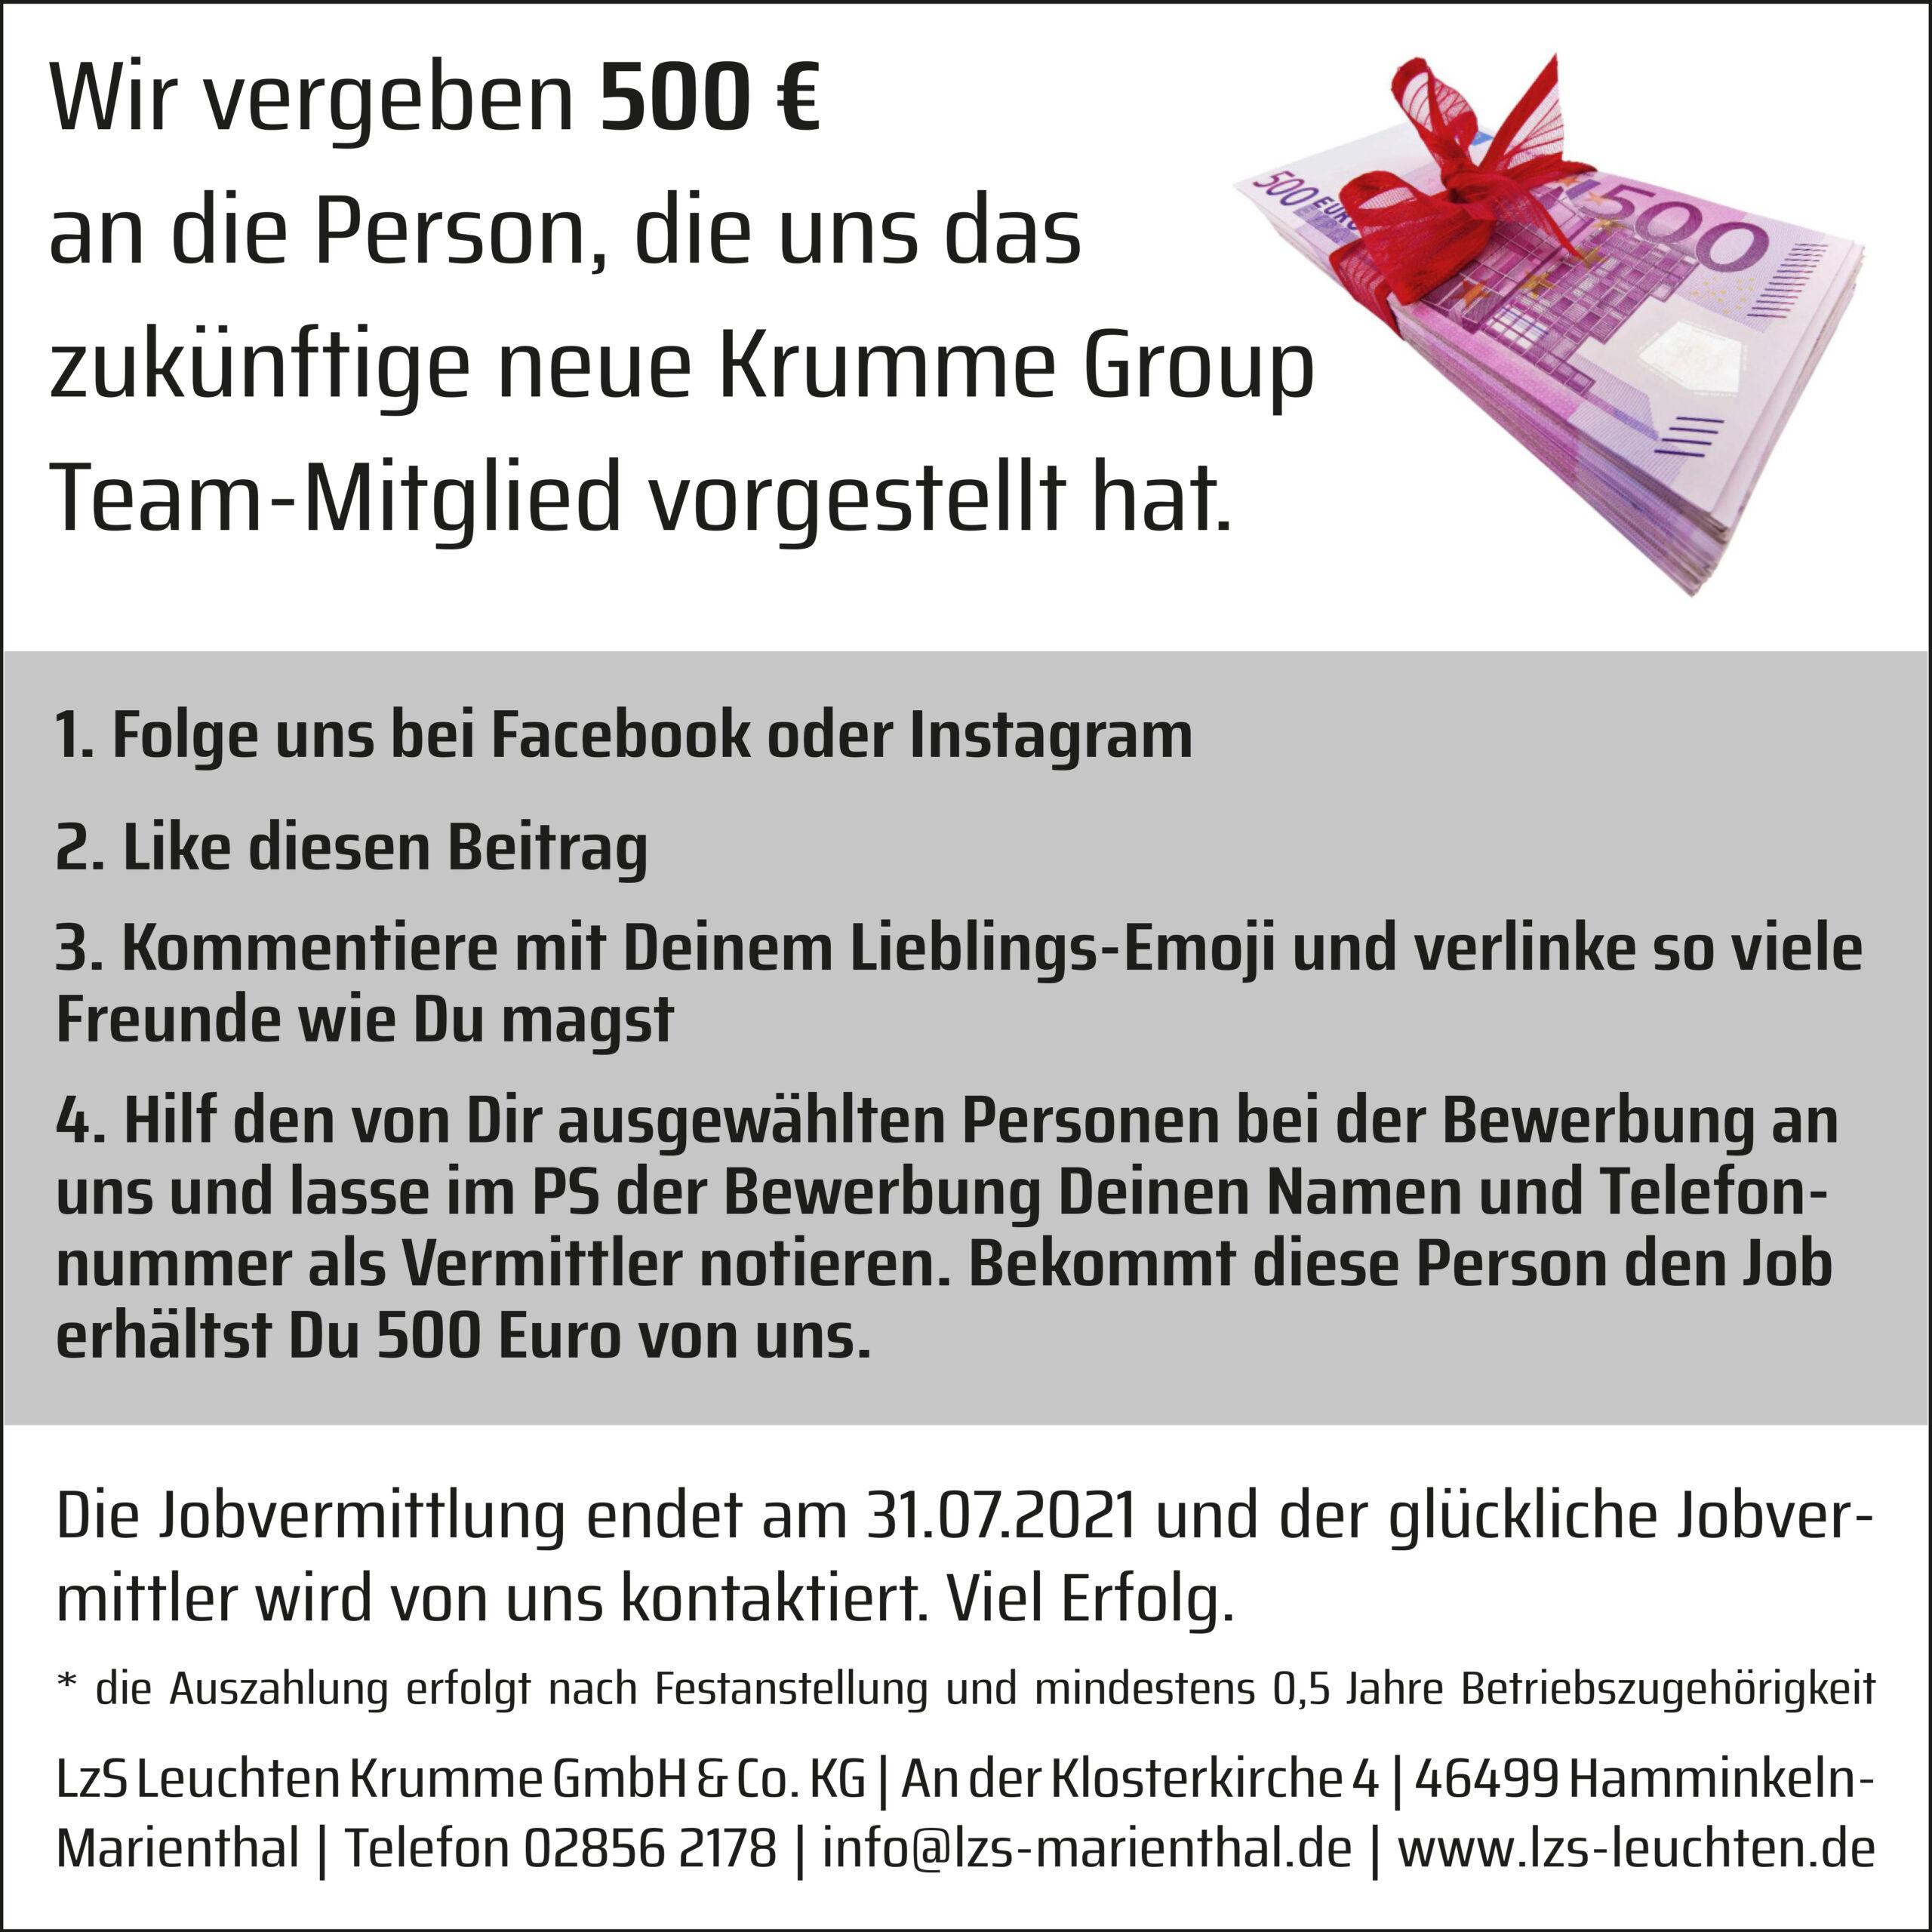 Krumme Group – Job vermitteln Bedingungen